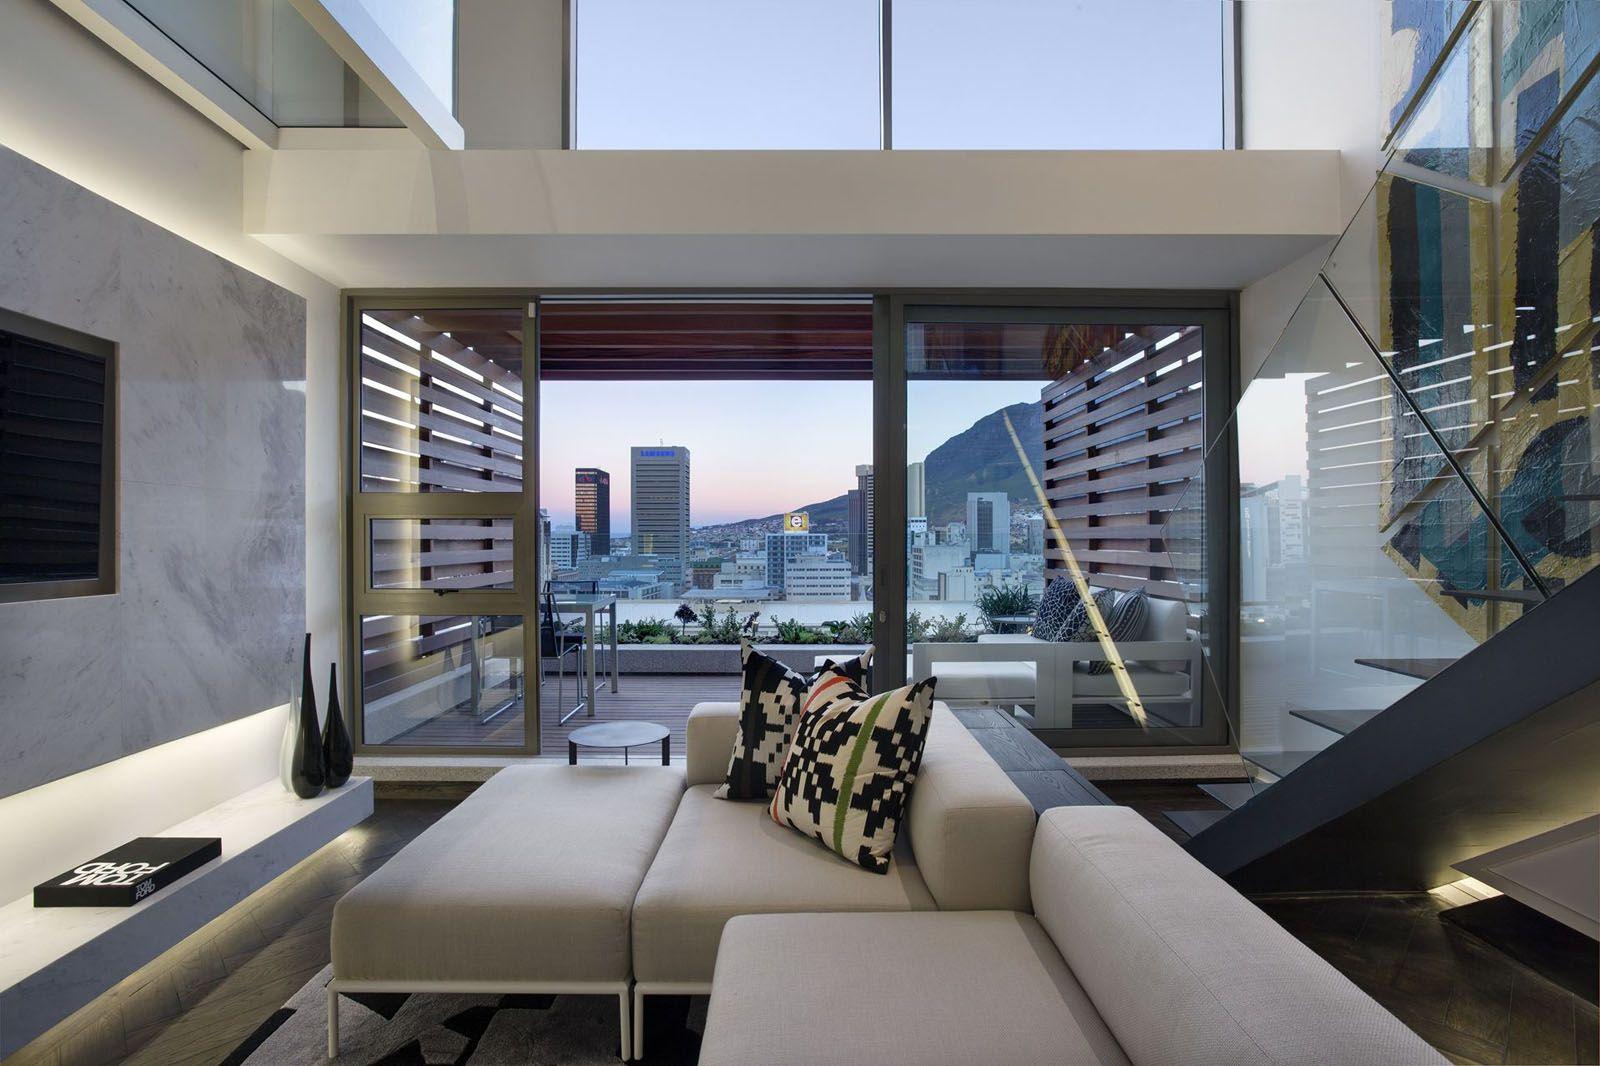 Awesome image of luxury loft apartment modern luxury loft apartment modern trendy cape town waterfront duplex penthouse apartment idesignarch